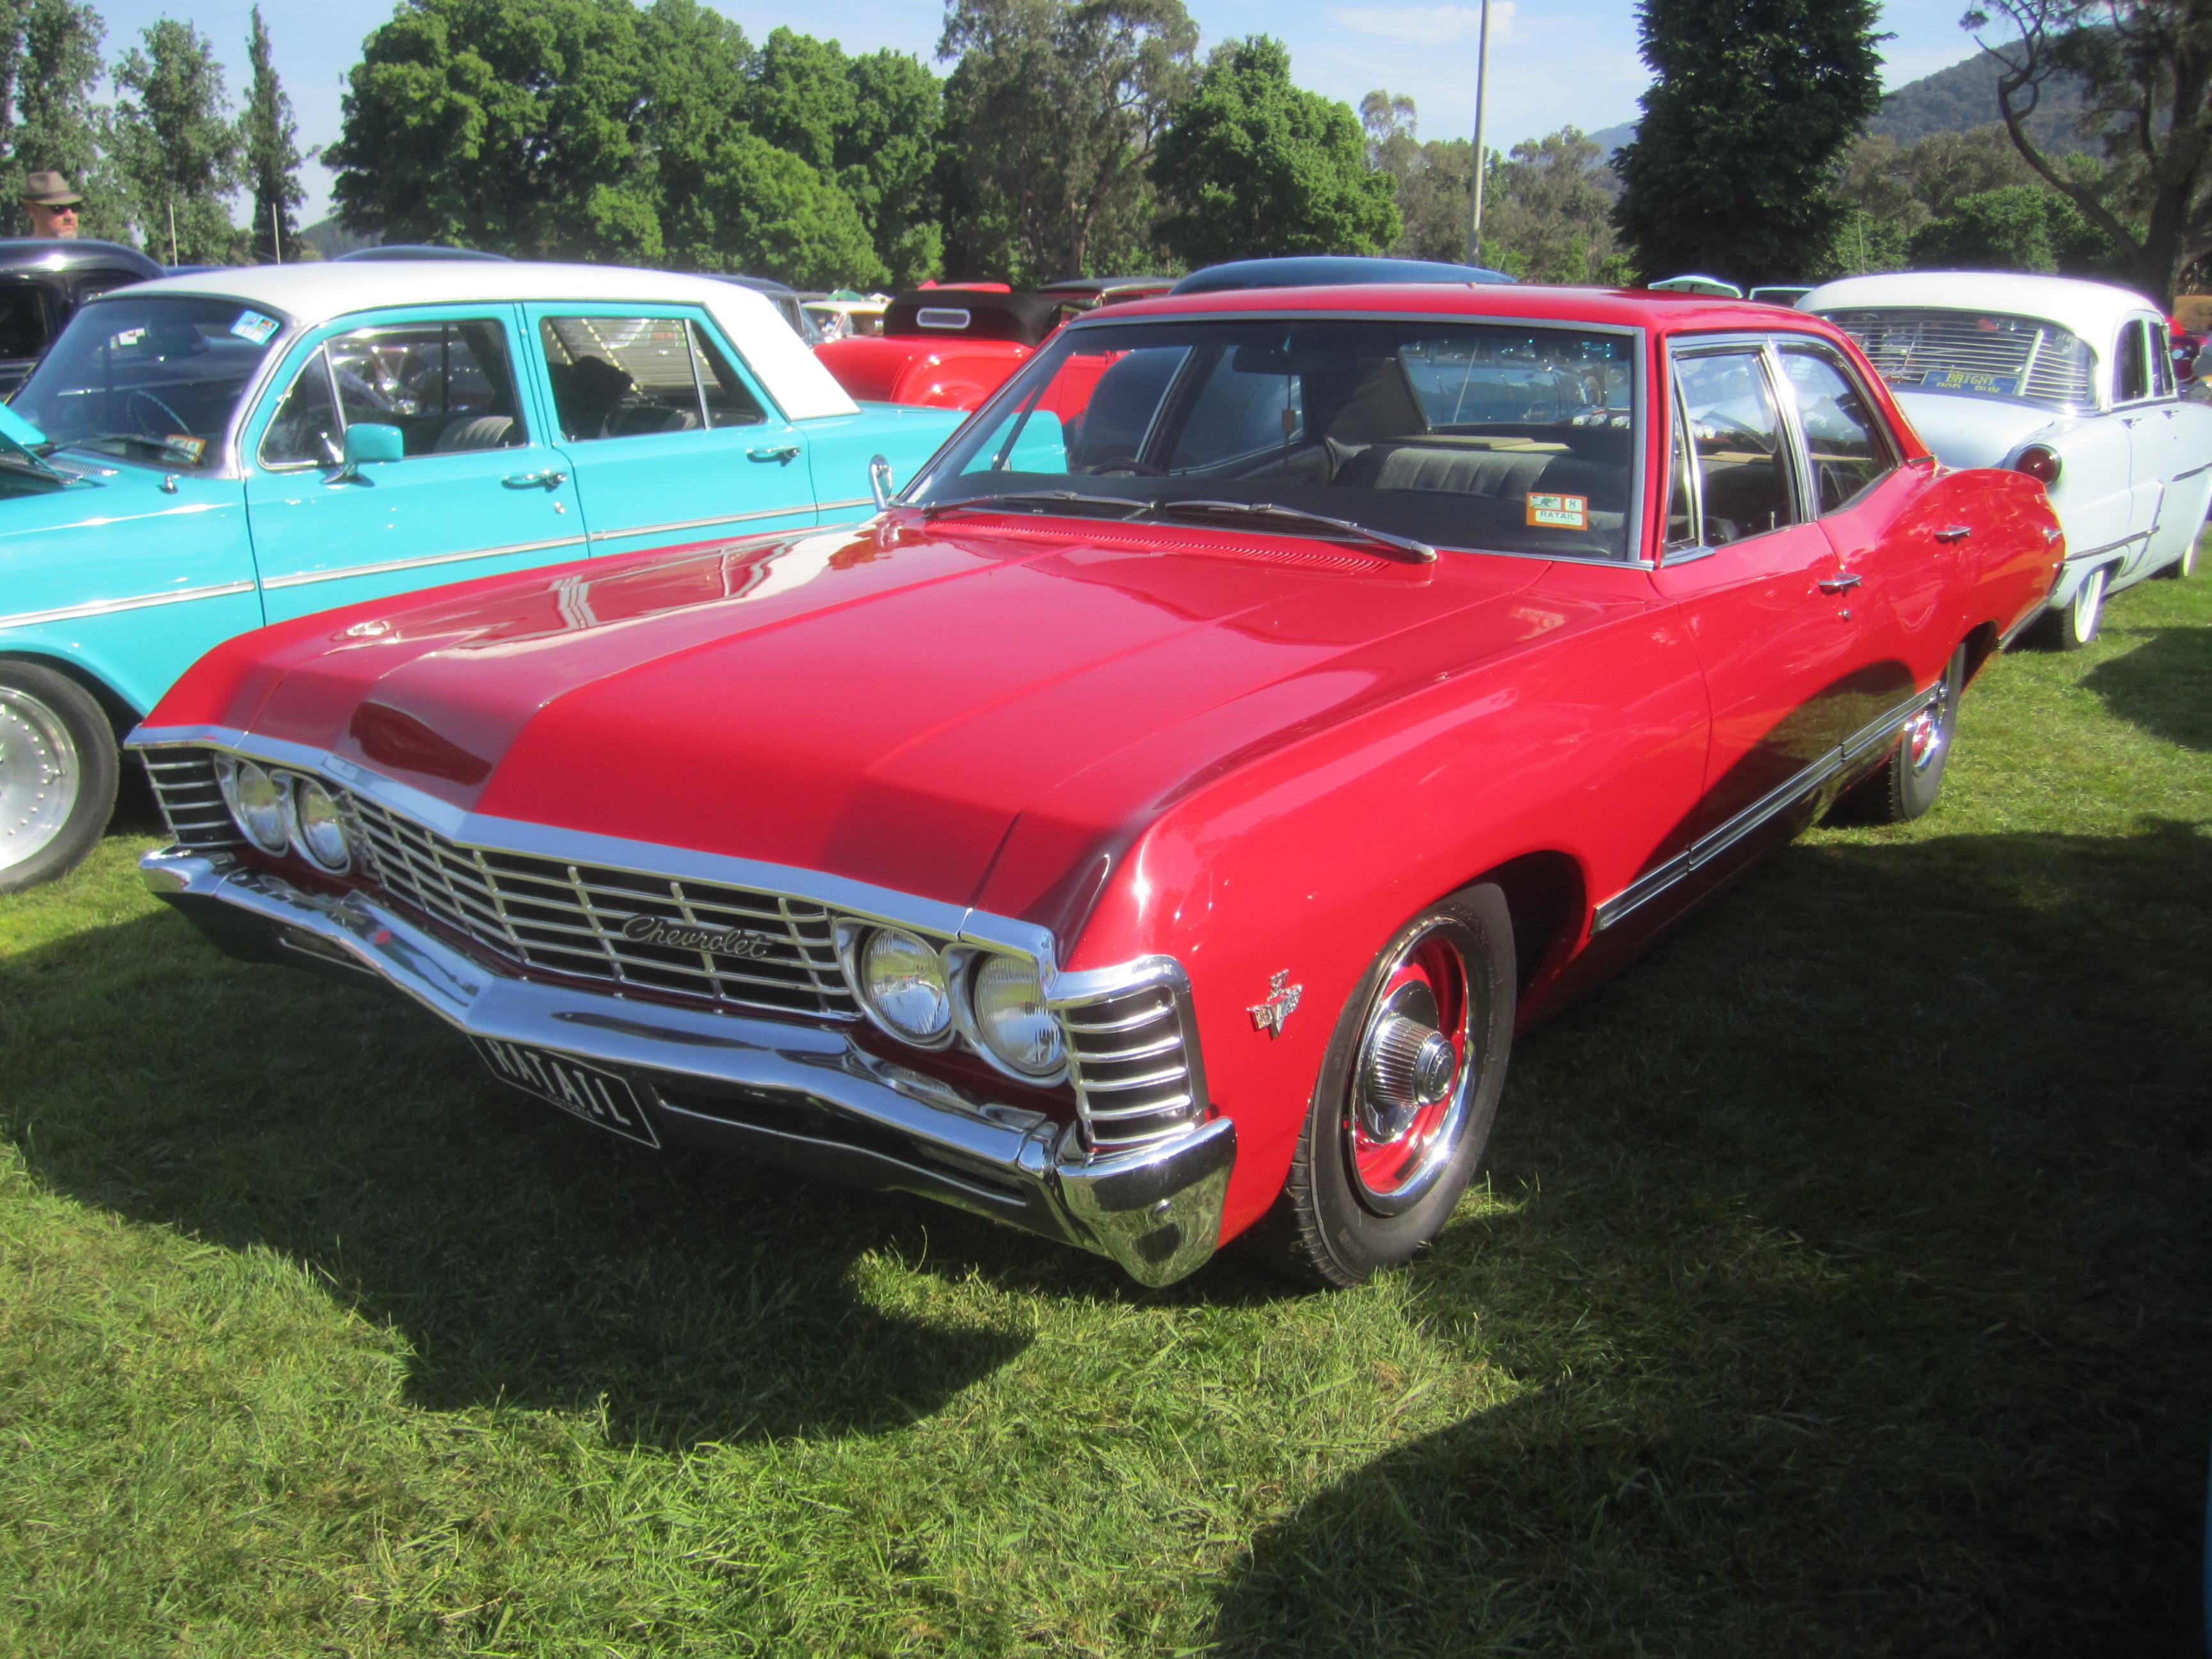 1967 chevrolet impala 4 door sedan autos post. Black Bedroom Furniture Sets. Home Design Ideas